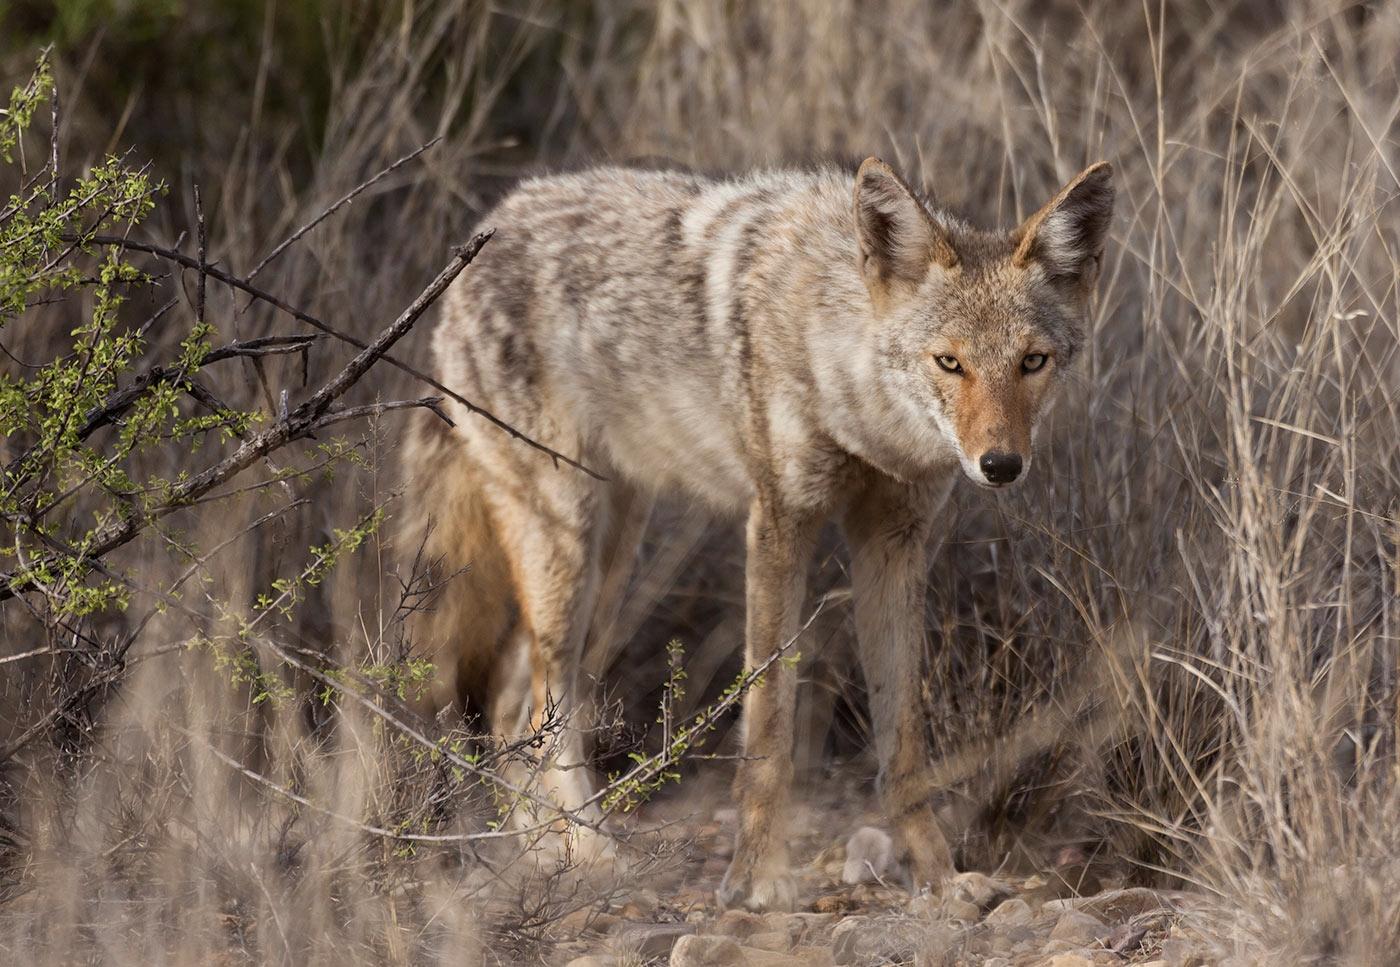 Big-Bend-National-Park-ABP-Coyote_Paint-Gap.jpg